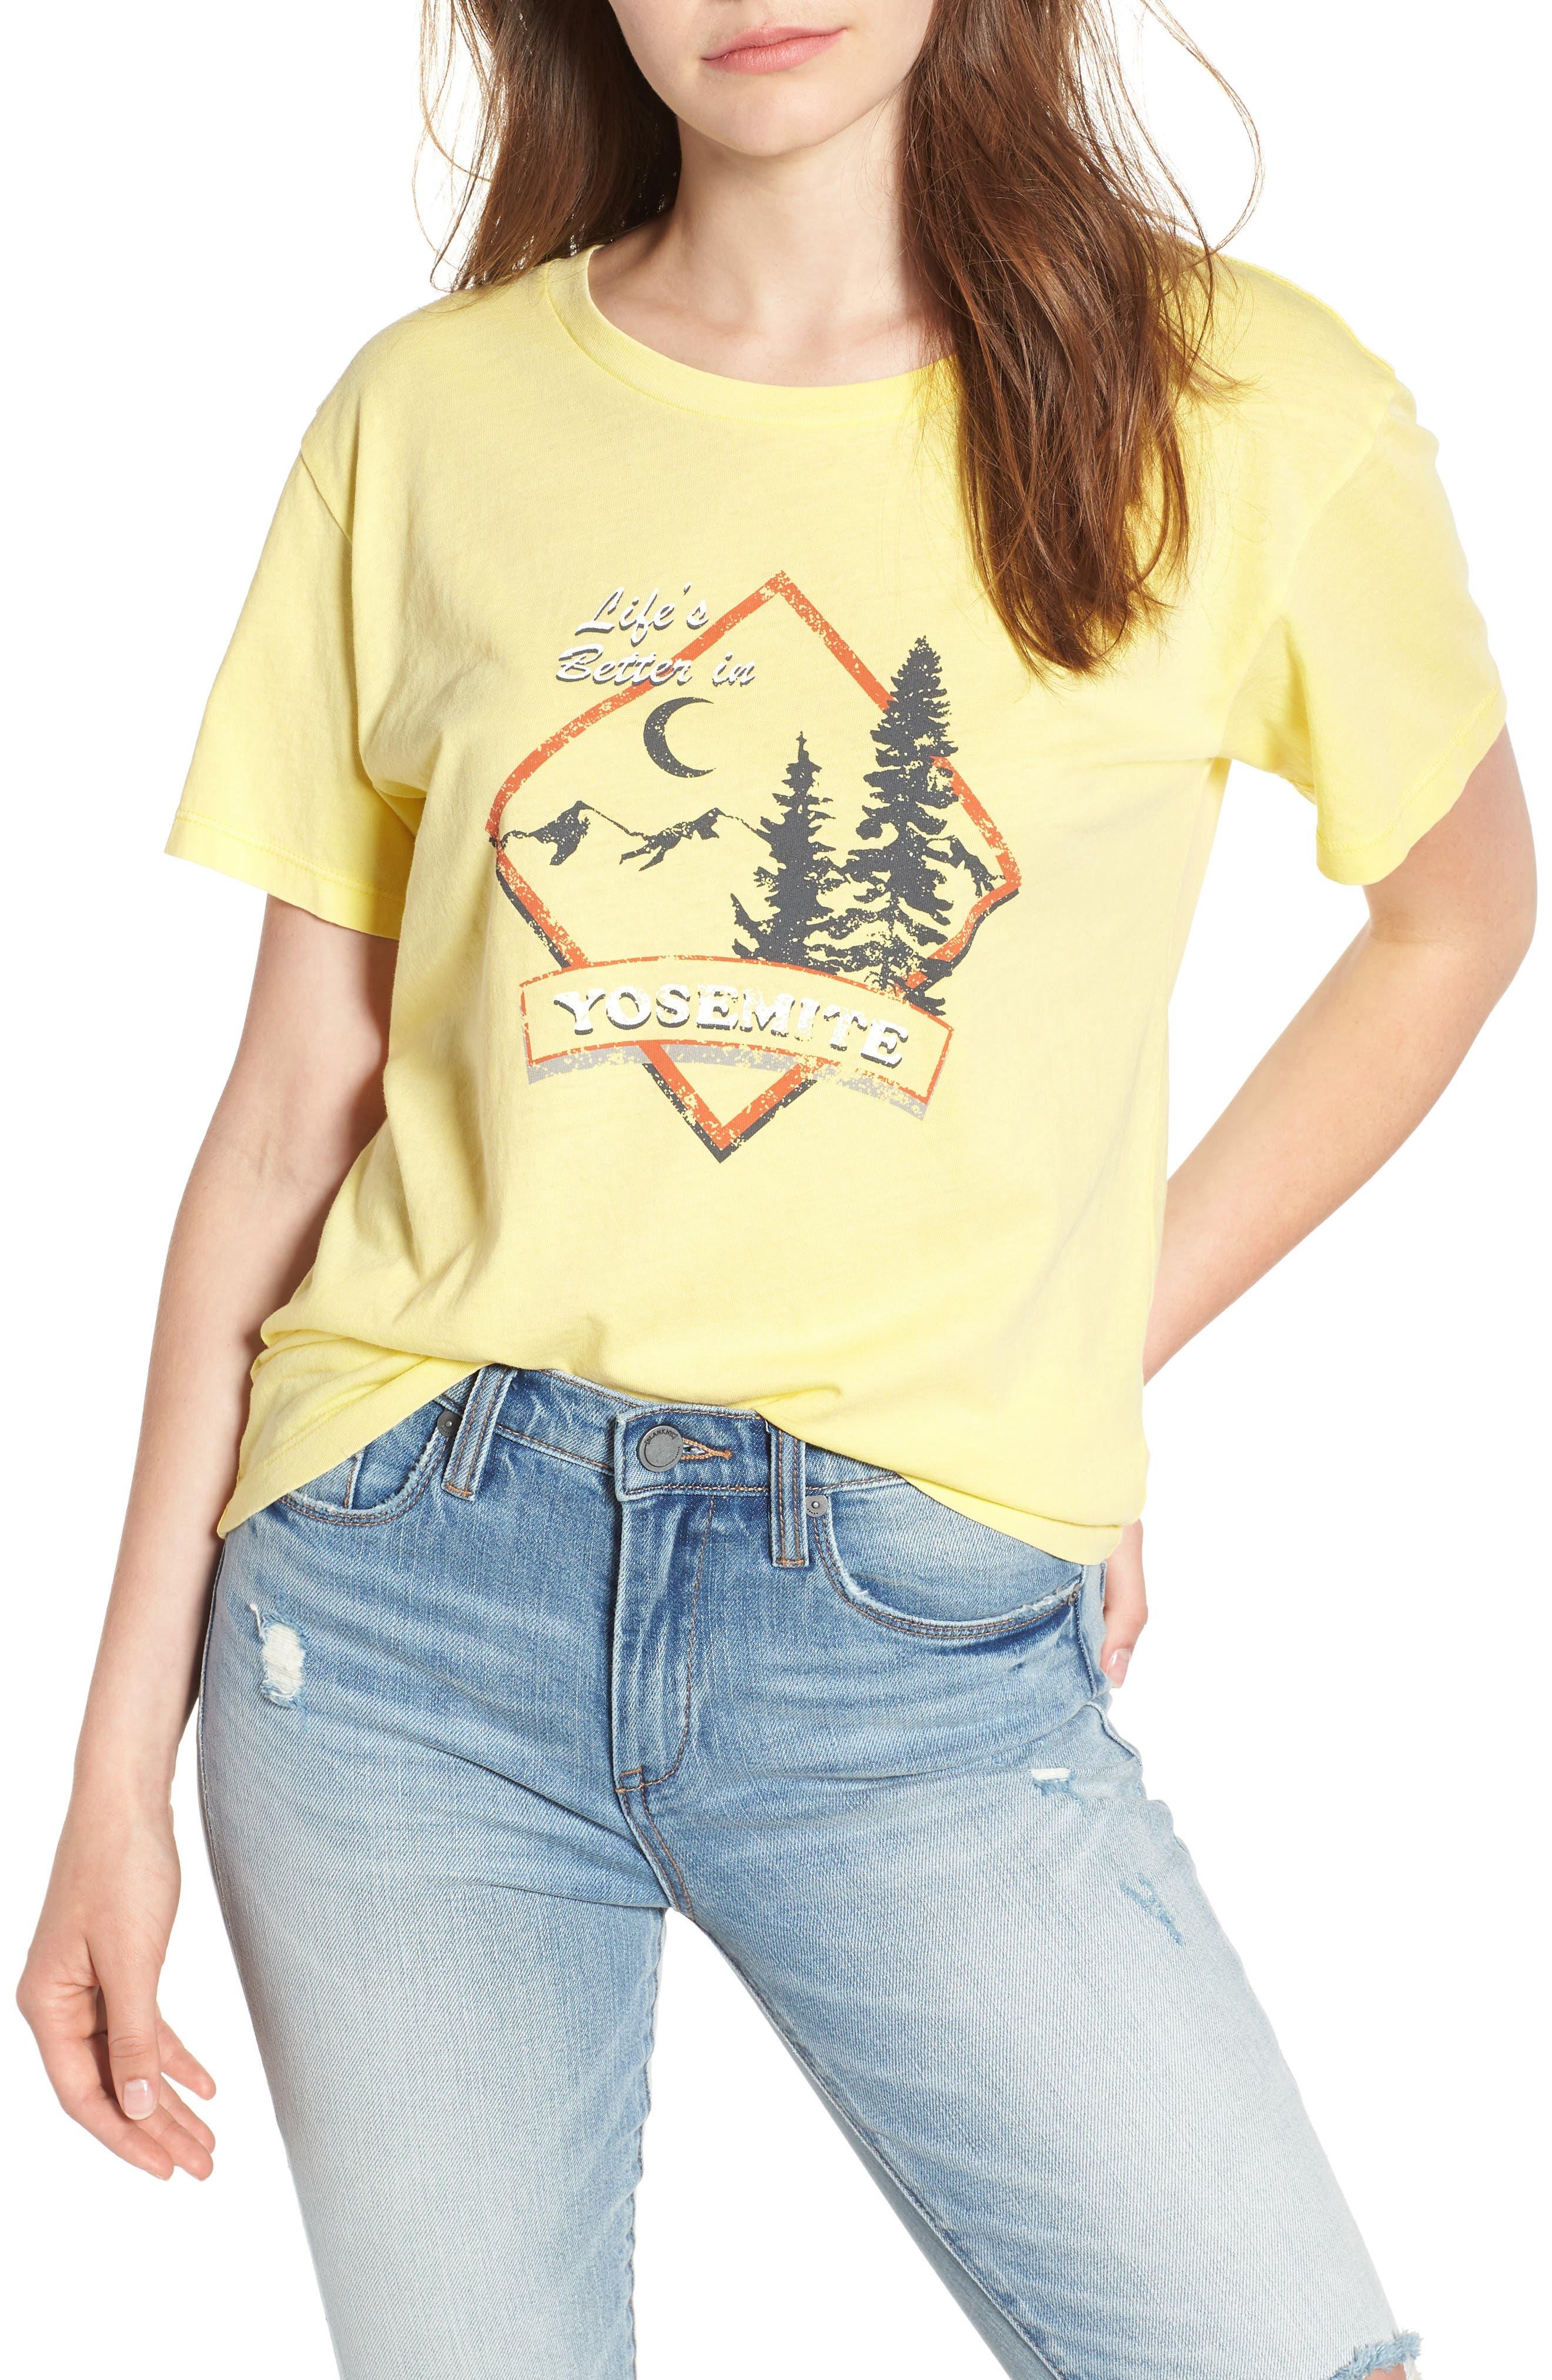 Yosemite Graphic Tee,                             Main thumbnail 1, color,                             Washed Yellow